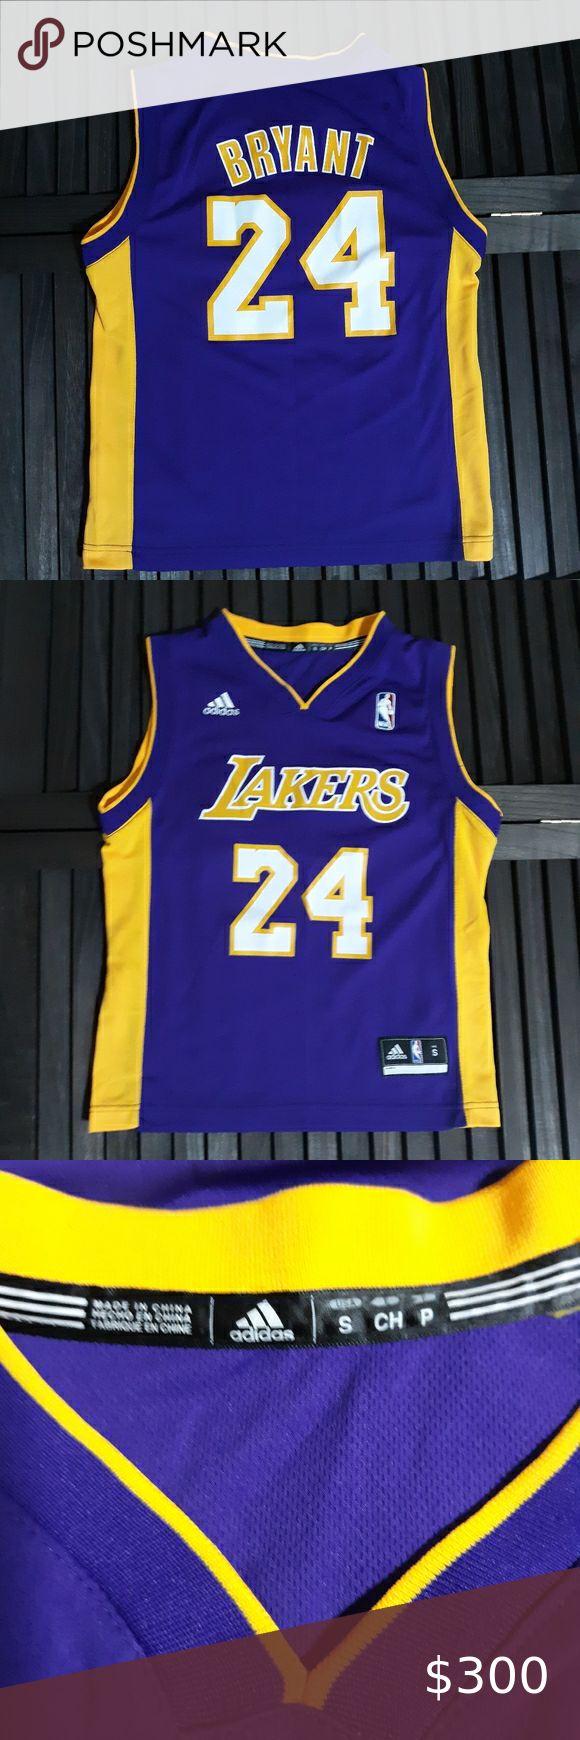 ADIDAS LAKERS Kobe Bryant Jersey Junior Small 8 | Lakers kobe ...